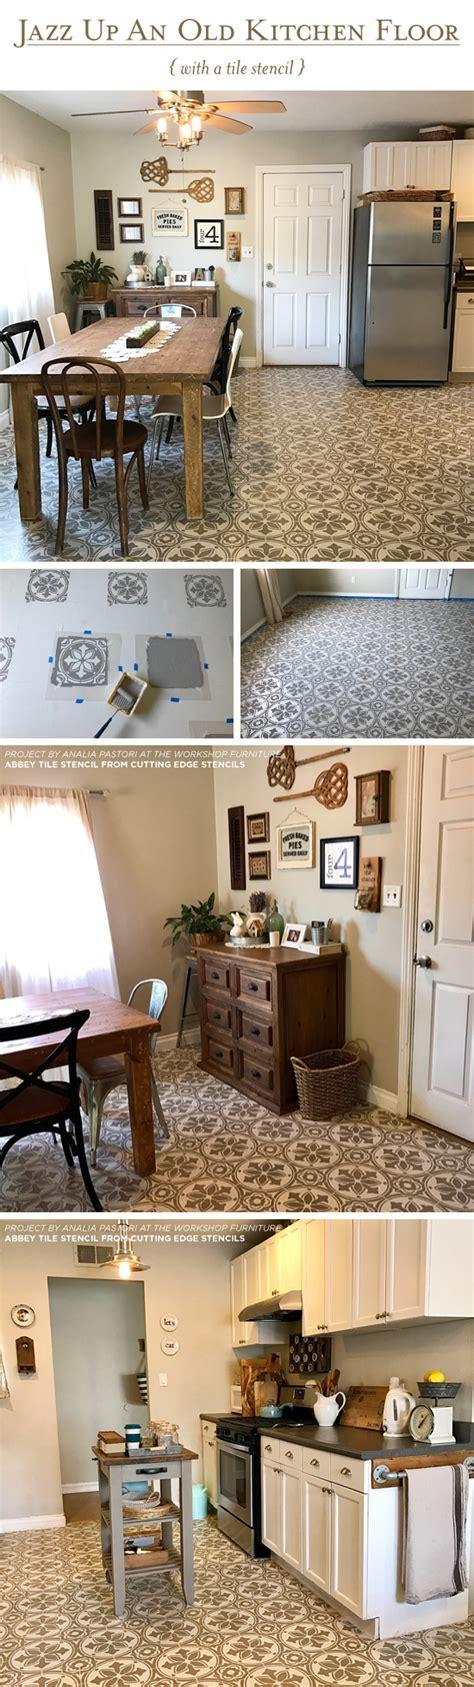 painted linoleum kitchen floor painted vinyl linoleum floor makeover ideas fox hollow 3995